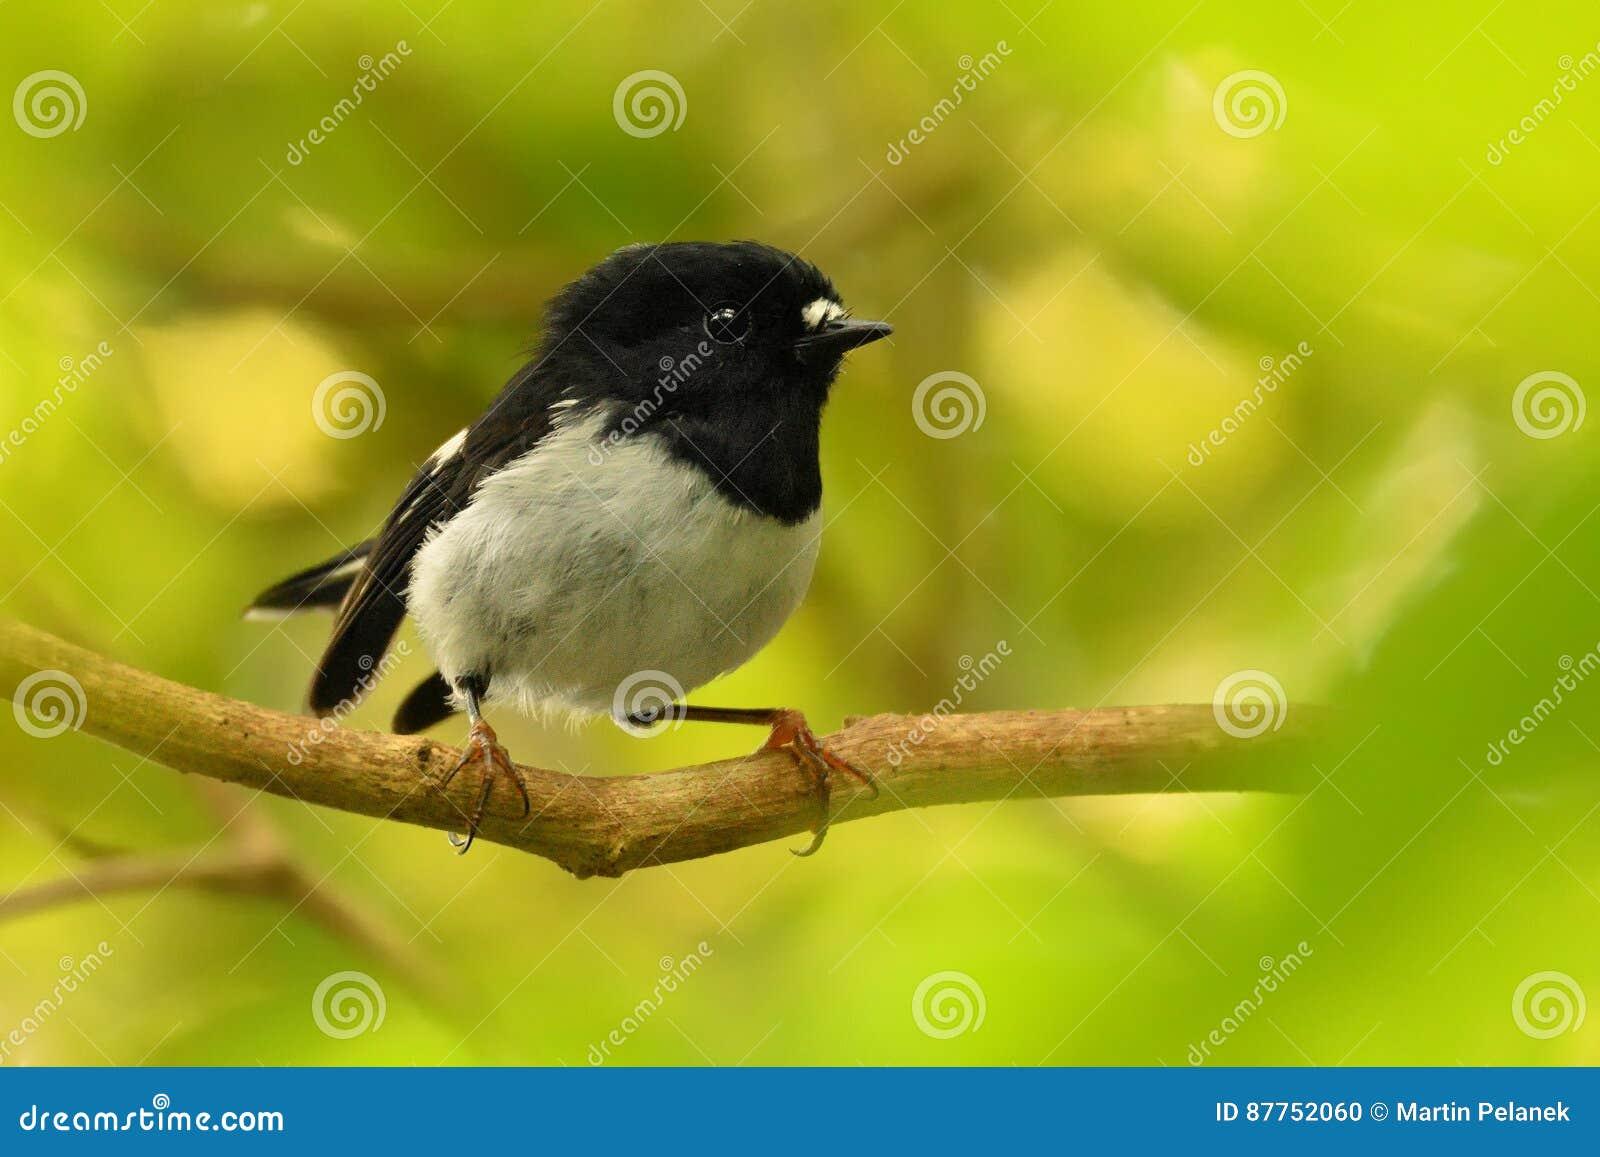 Petroica macrocephalatoitoi - den norr ön Tomtit - miromiro - nyazeeländsk skogfågel för endemisk